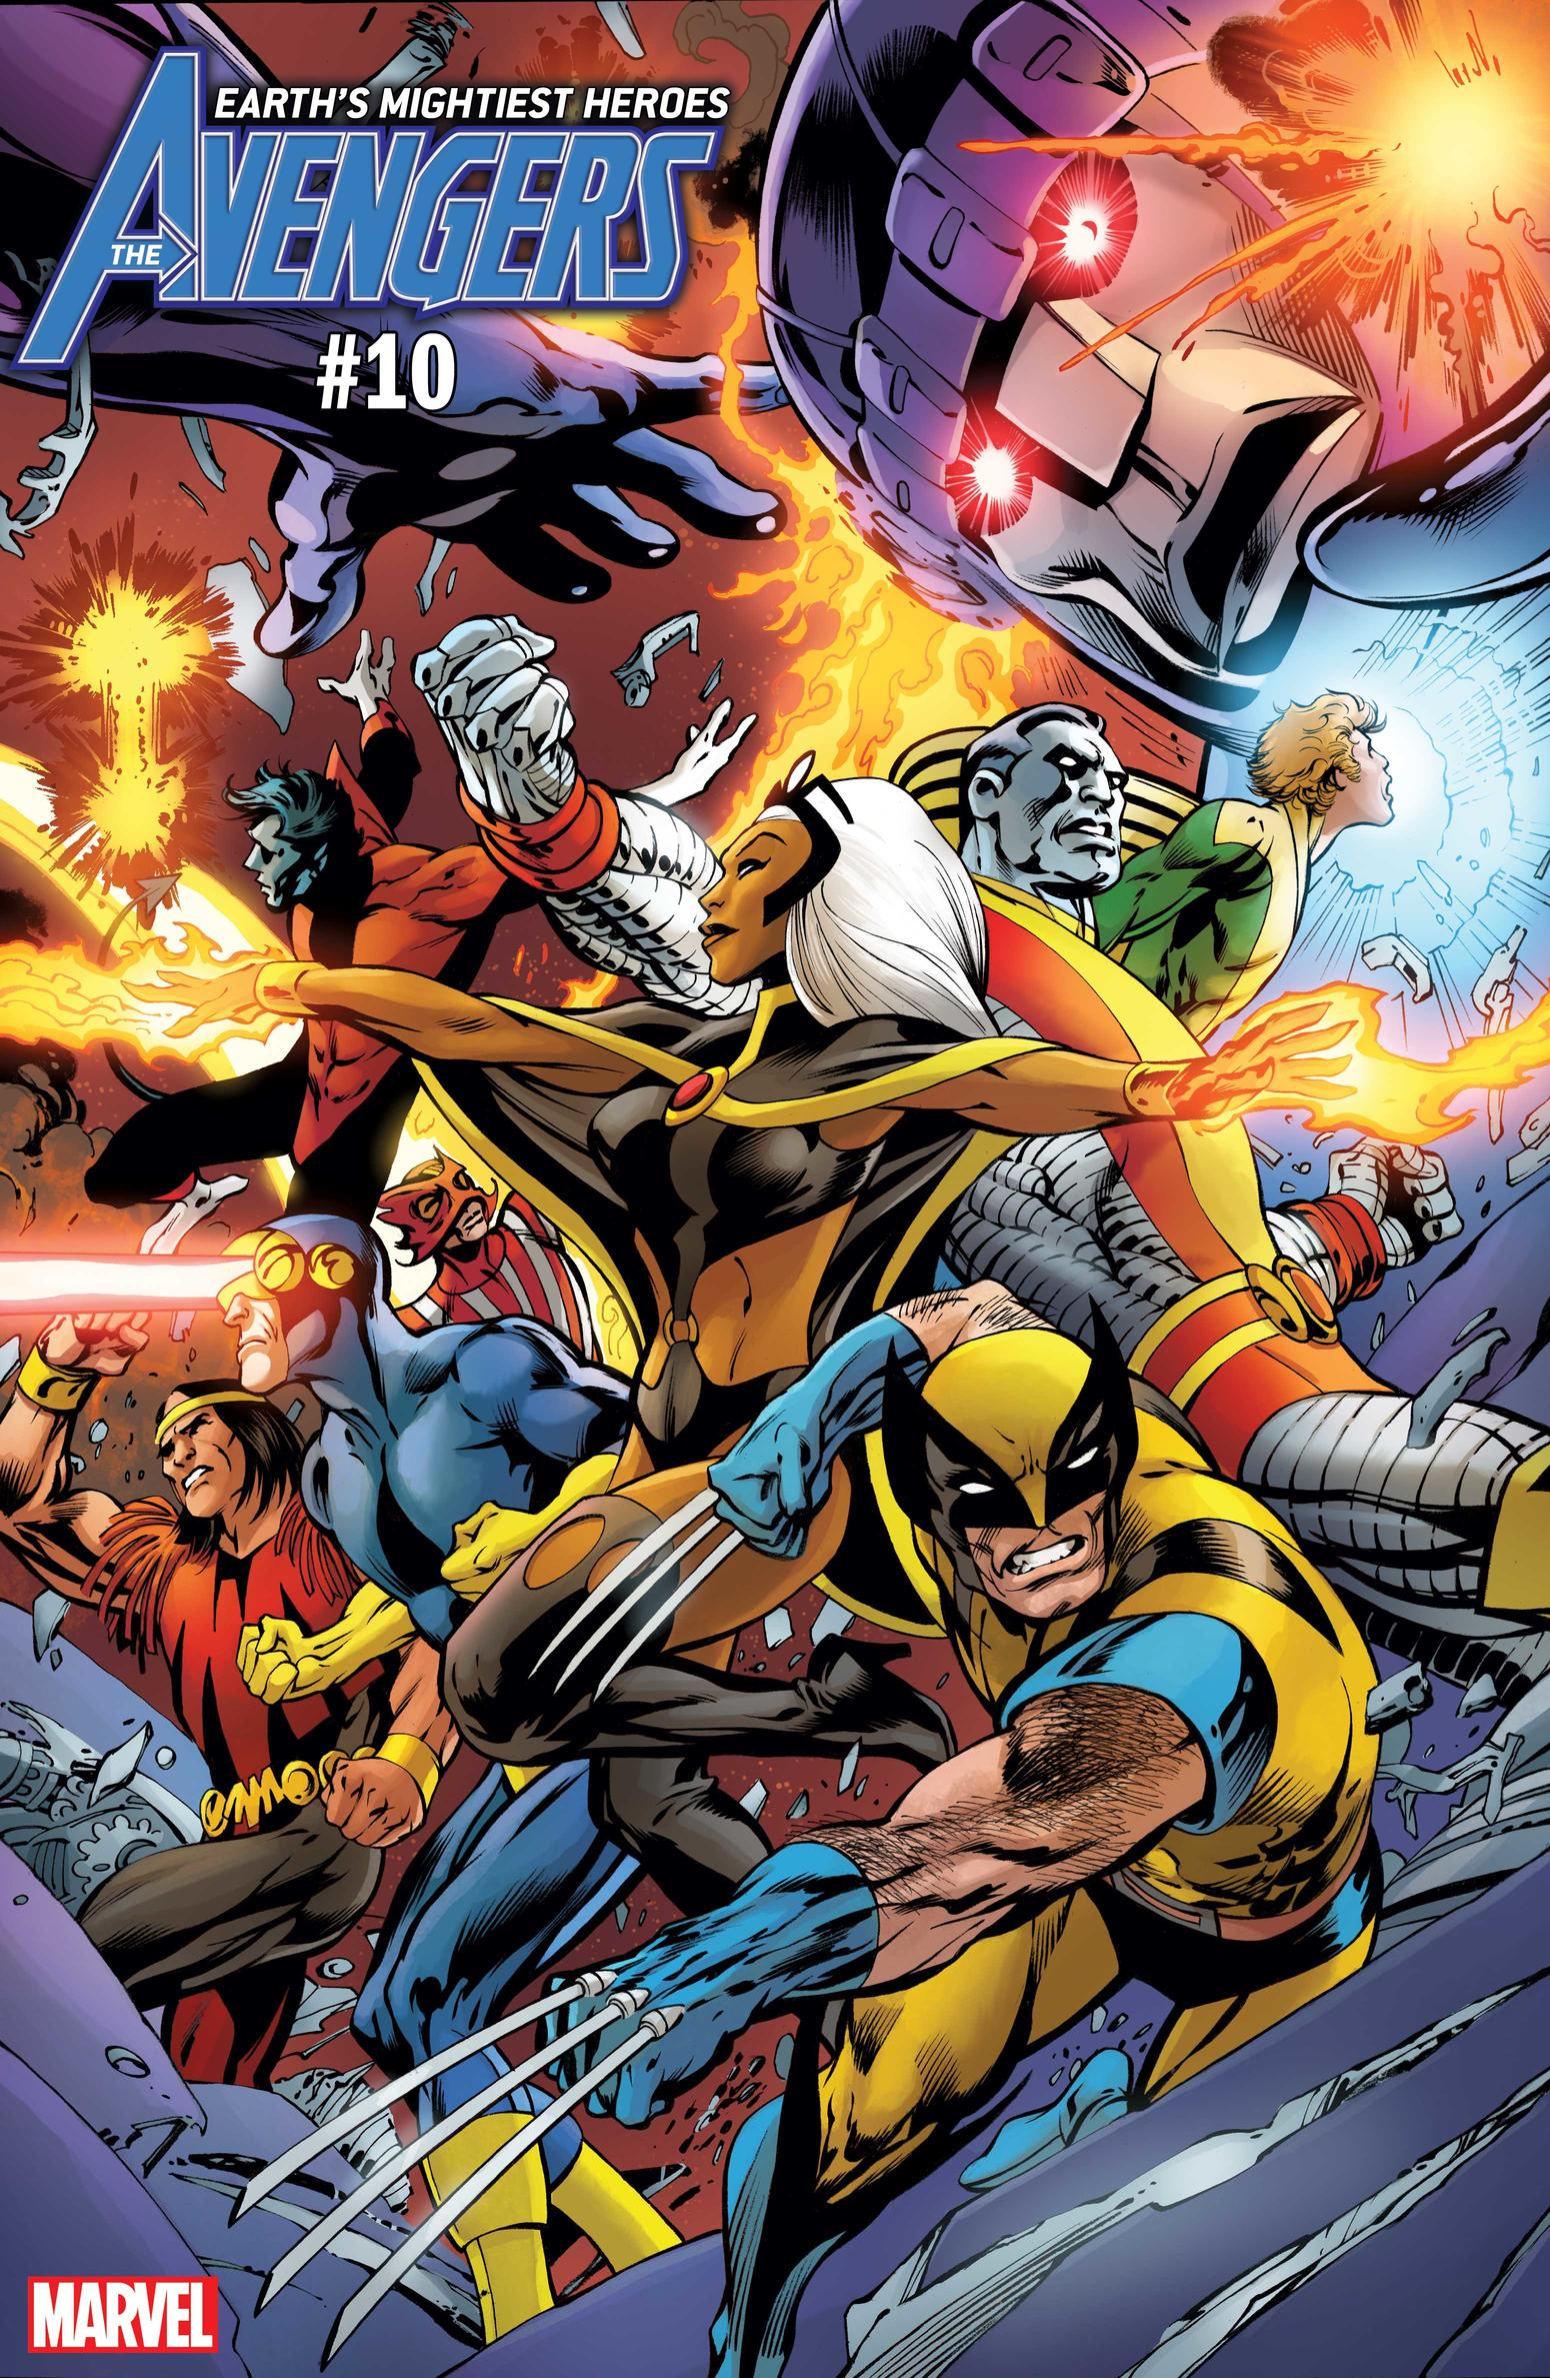 AVENGERS #10 / UNCANNY X-MEN VARIANT COVER by Alan Davis